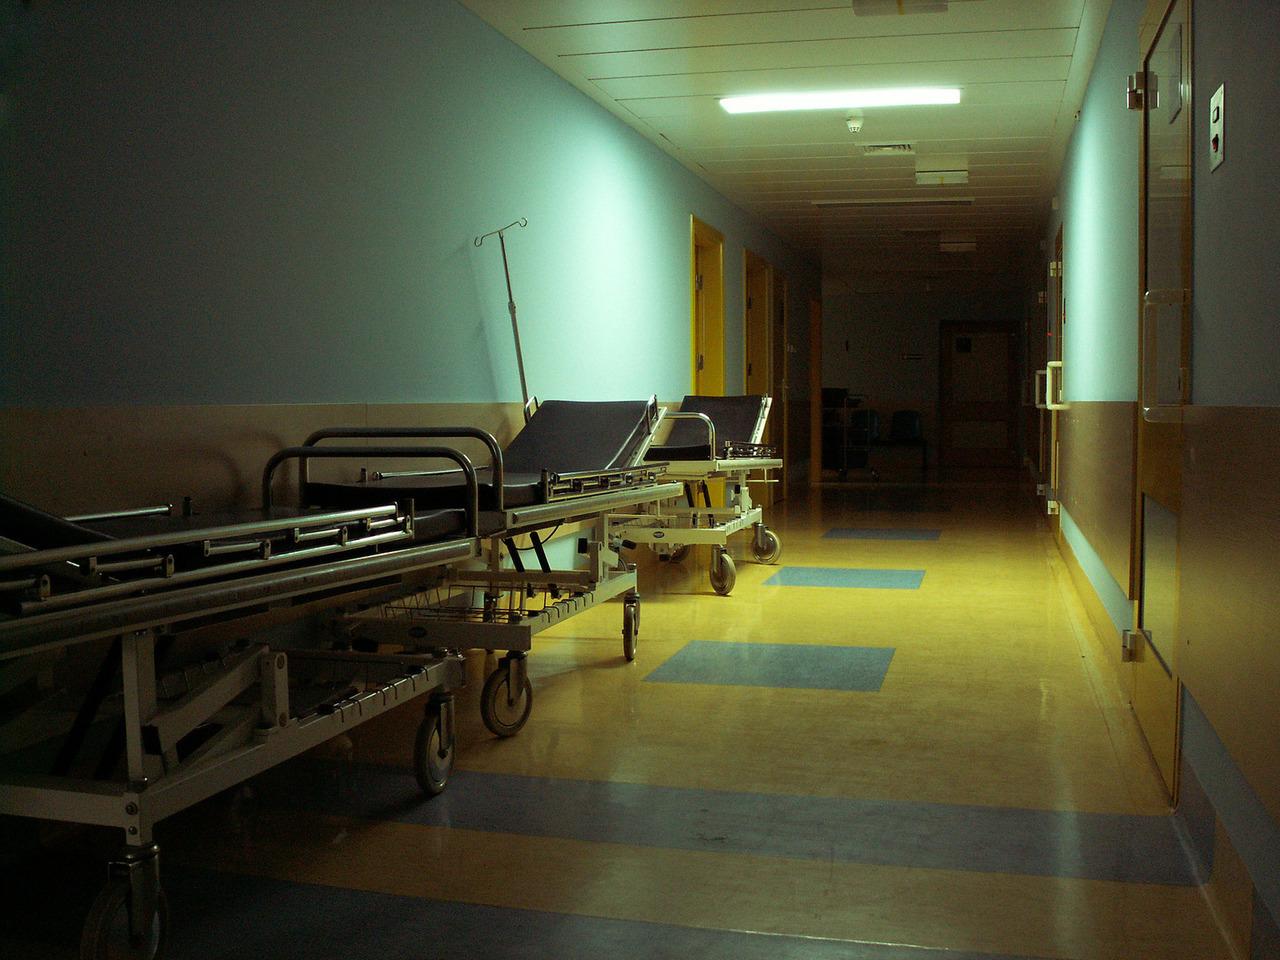 hospital-1233639-1280x960.jpg